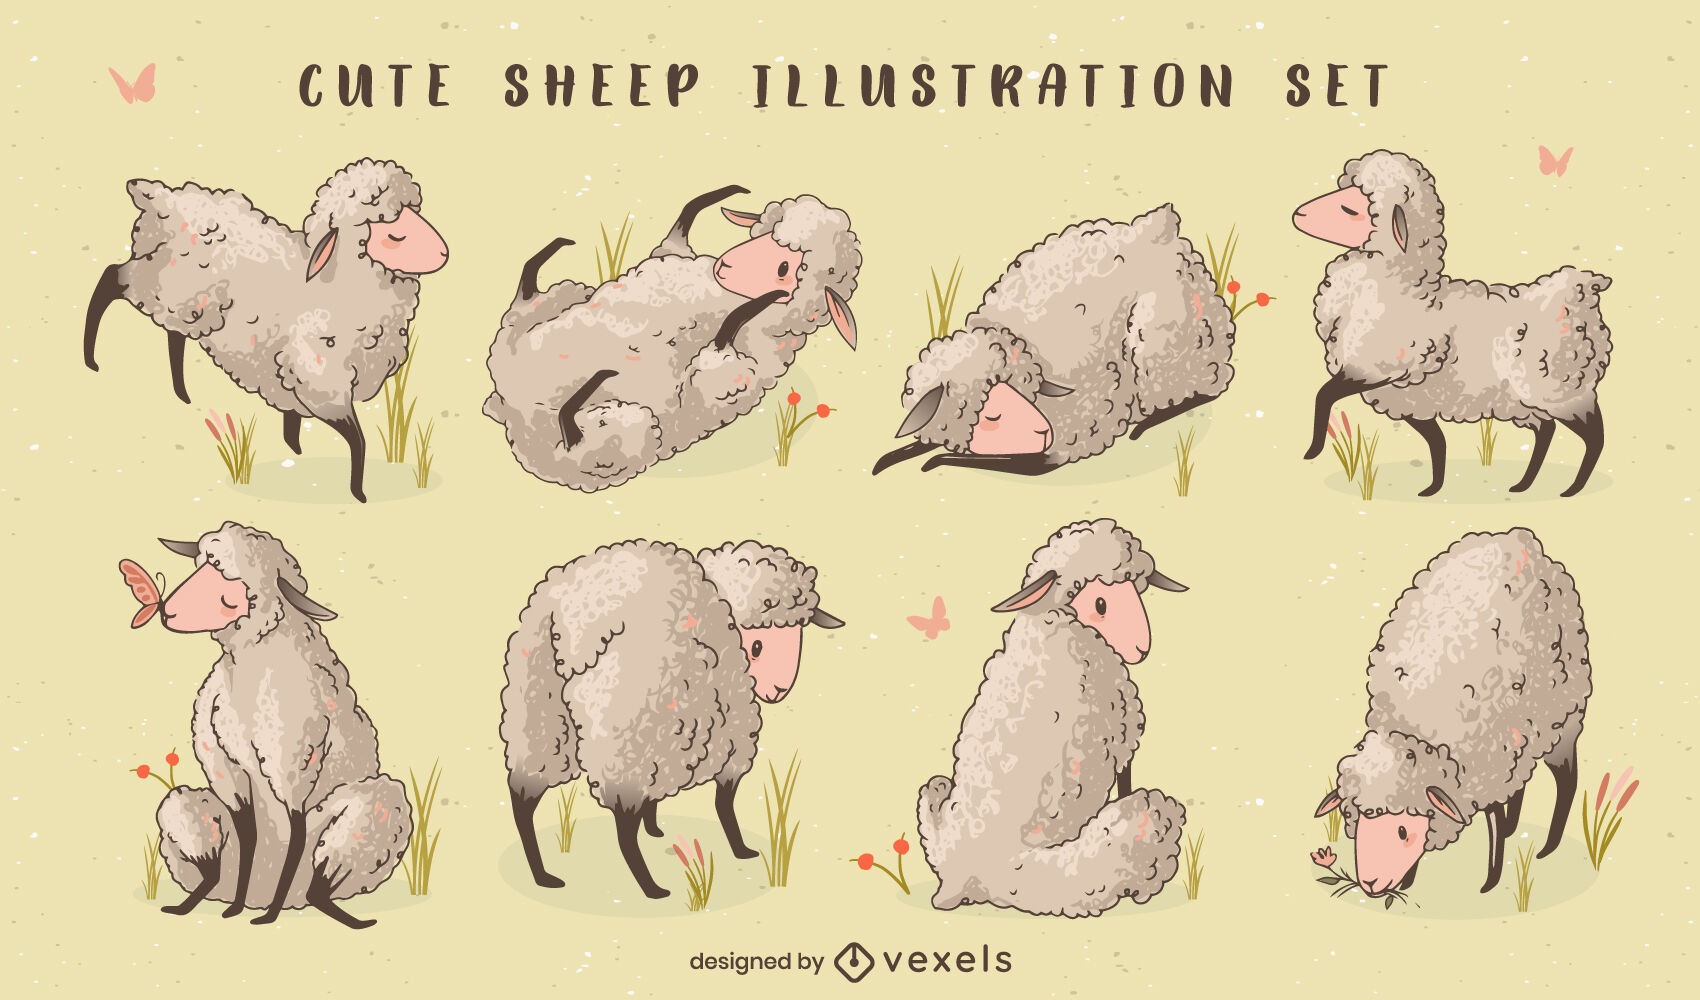 Sheep farm animals illustration set